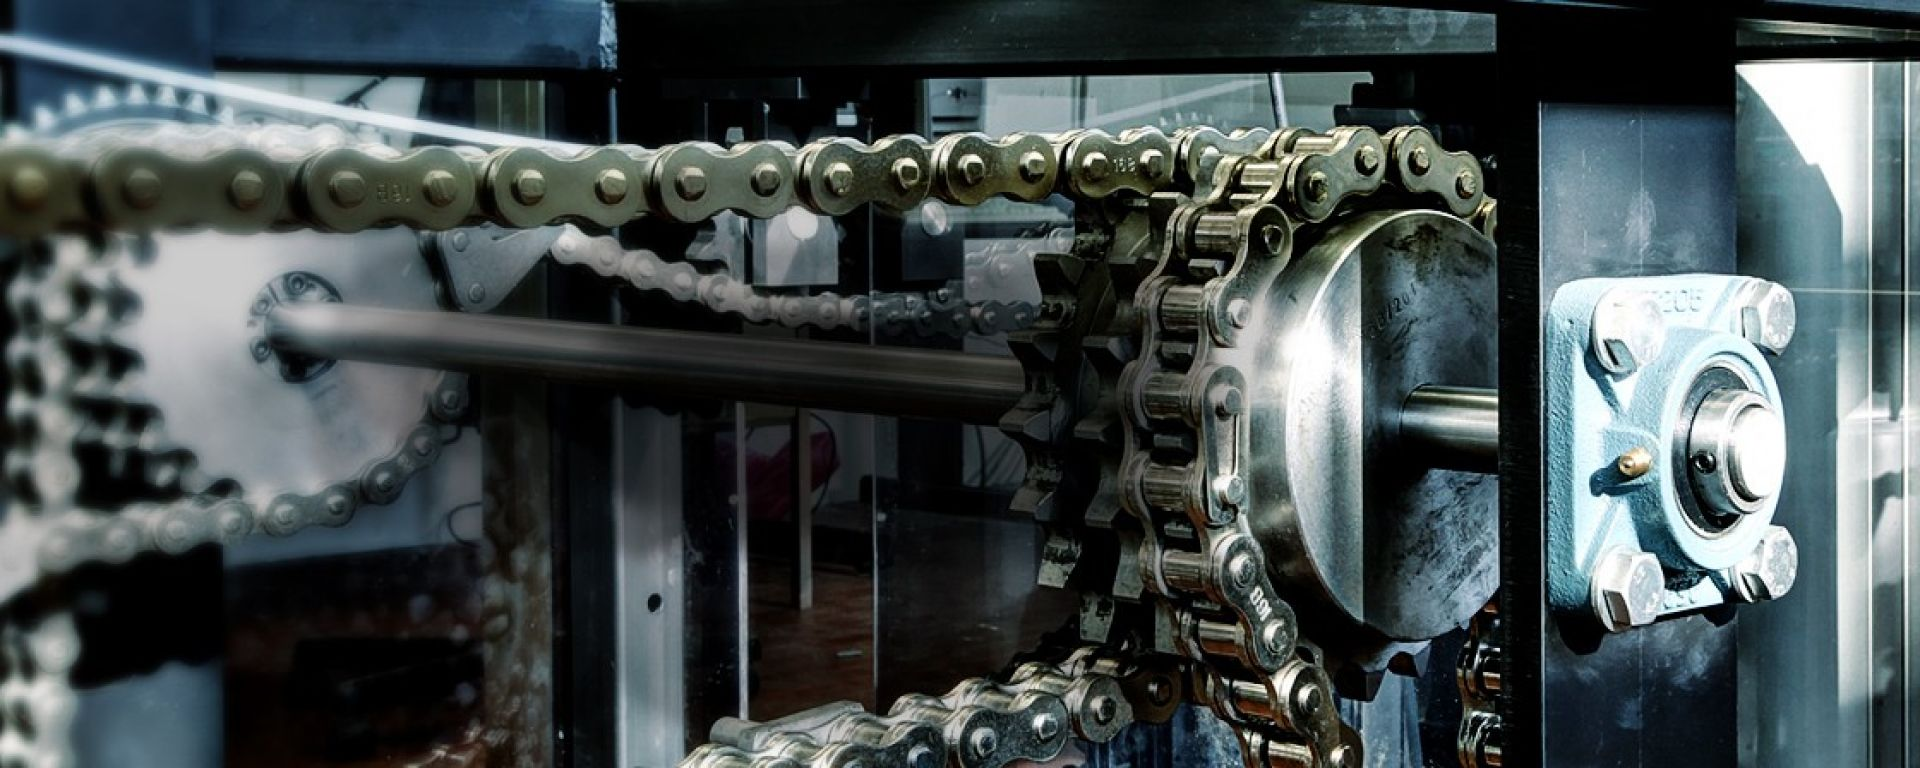 Ognibene Chaintech